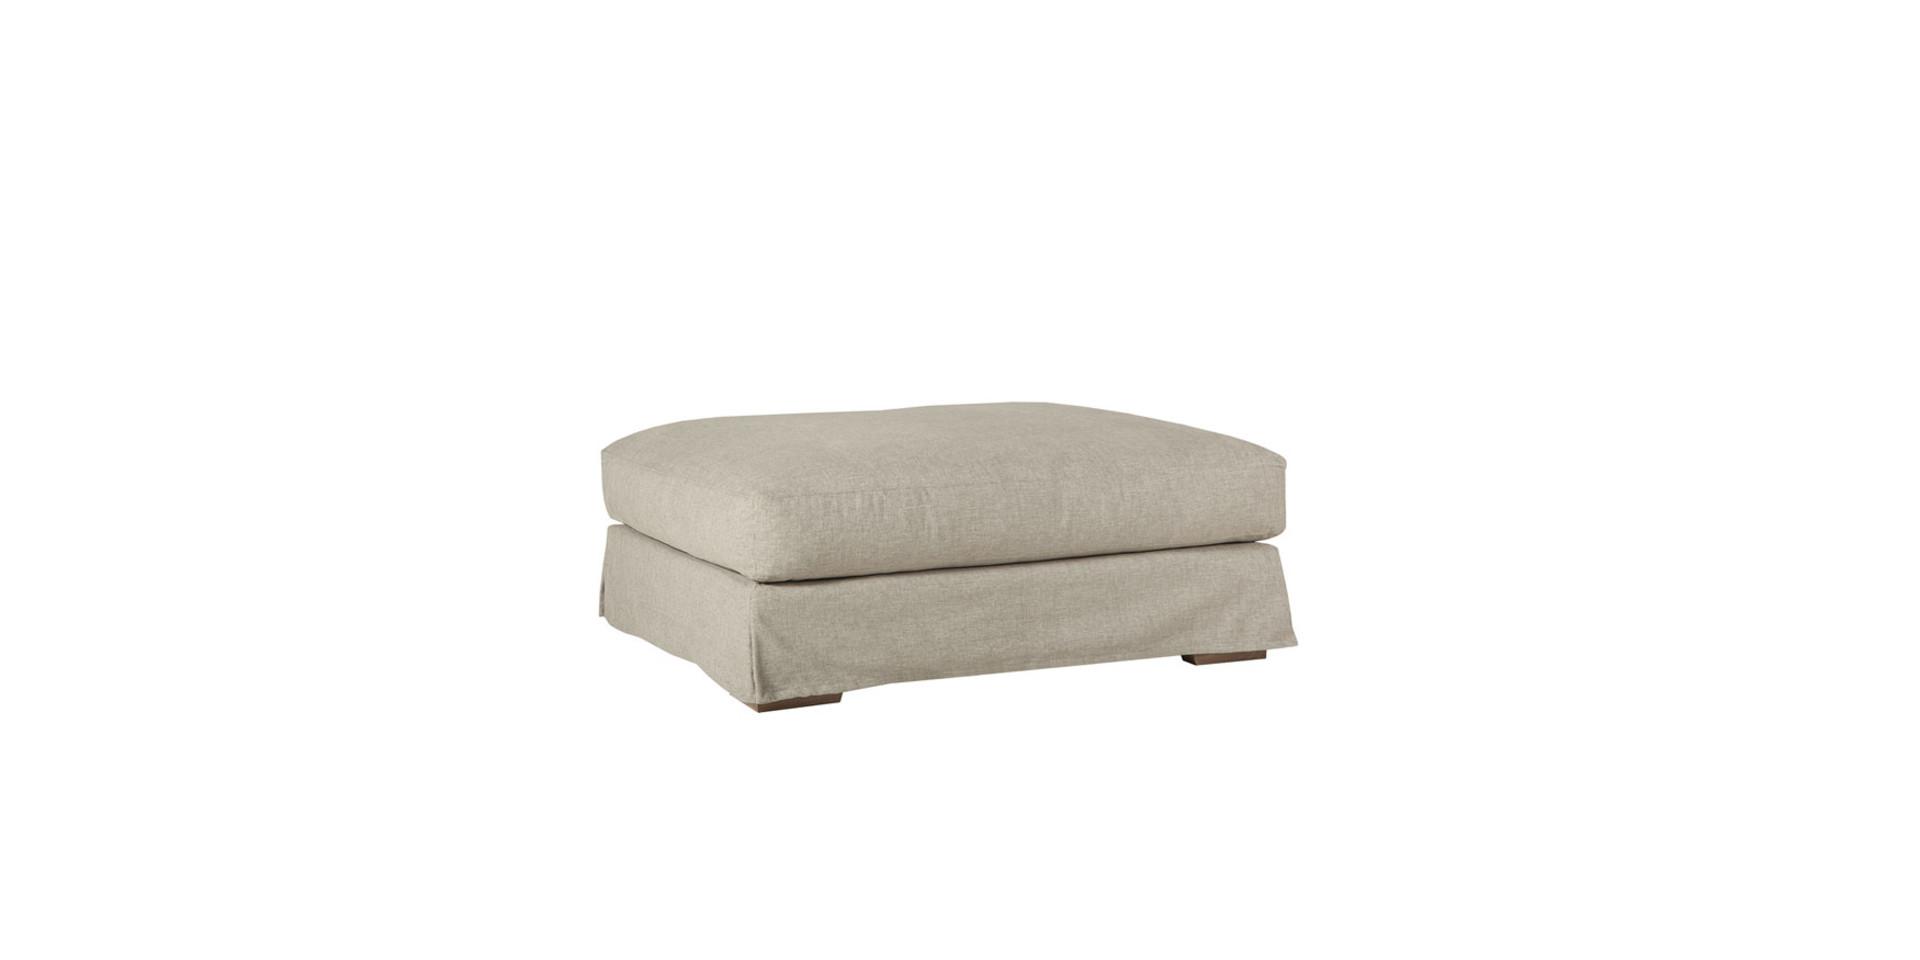 sits-heaven-pouf-footstool_drom11_light_brown_3_0